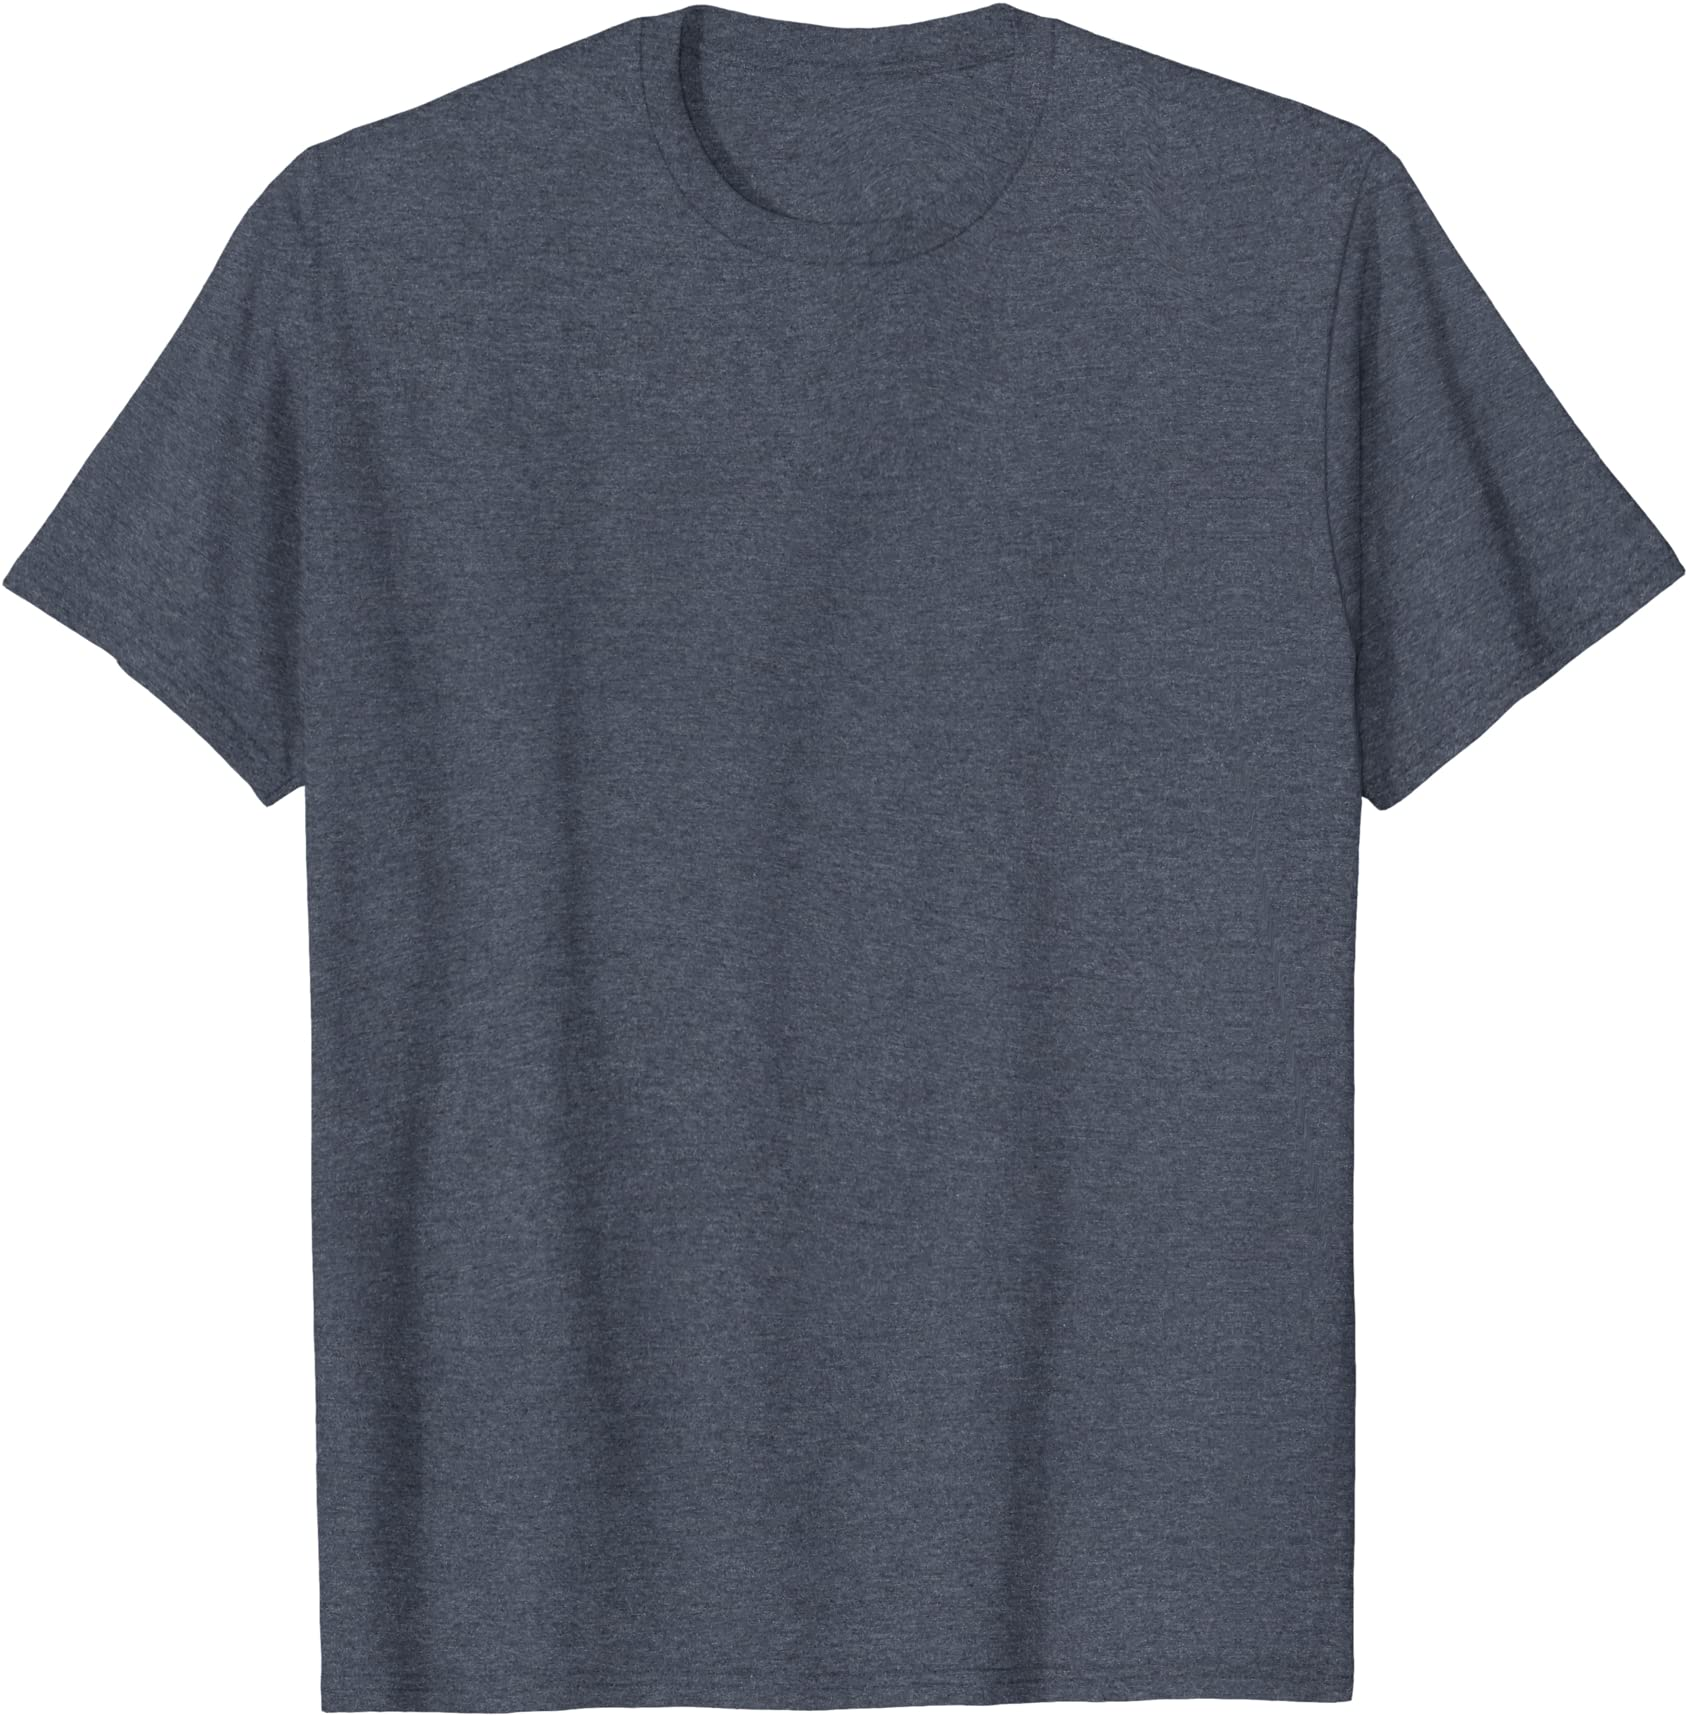 Montana Treasure State USA University Sports Short Sleeve T-Shirt Tees Tshirts